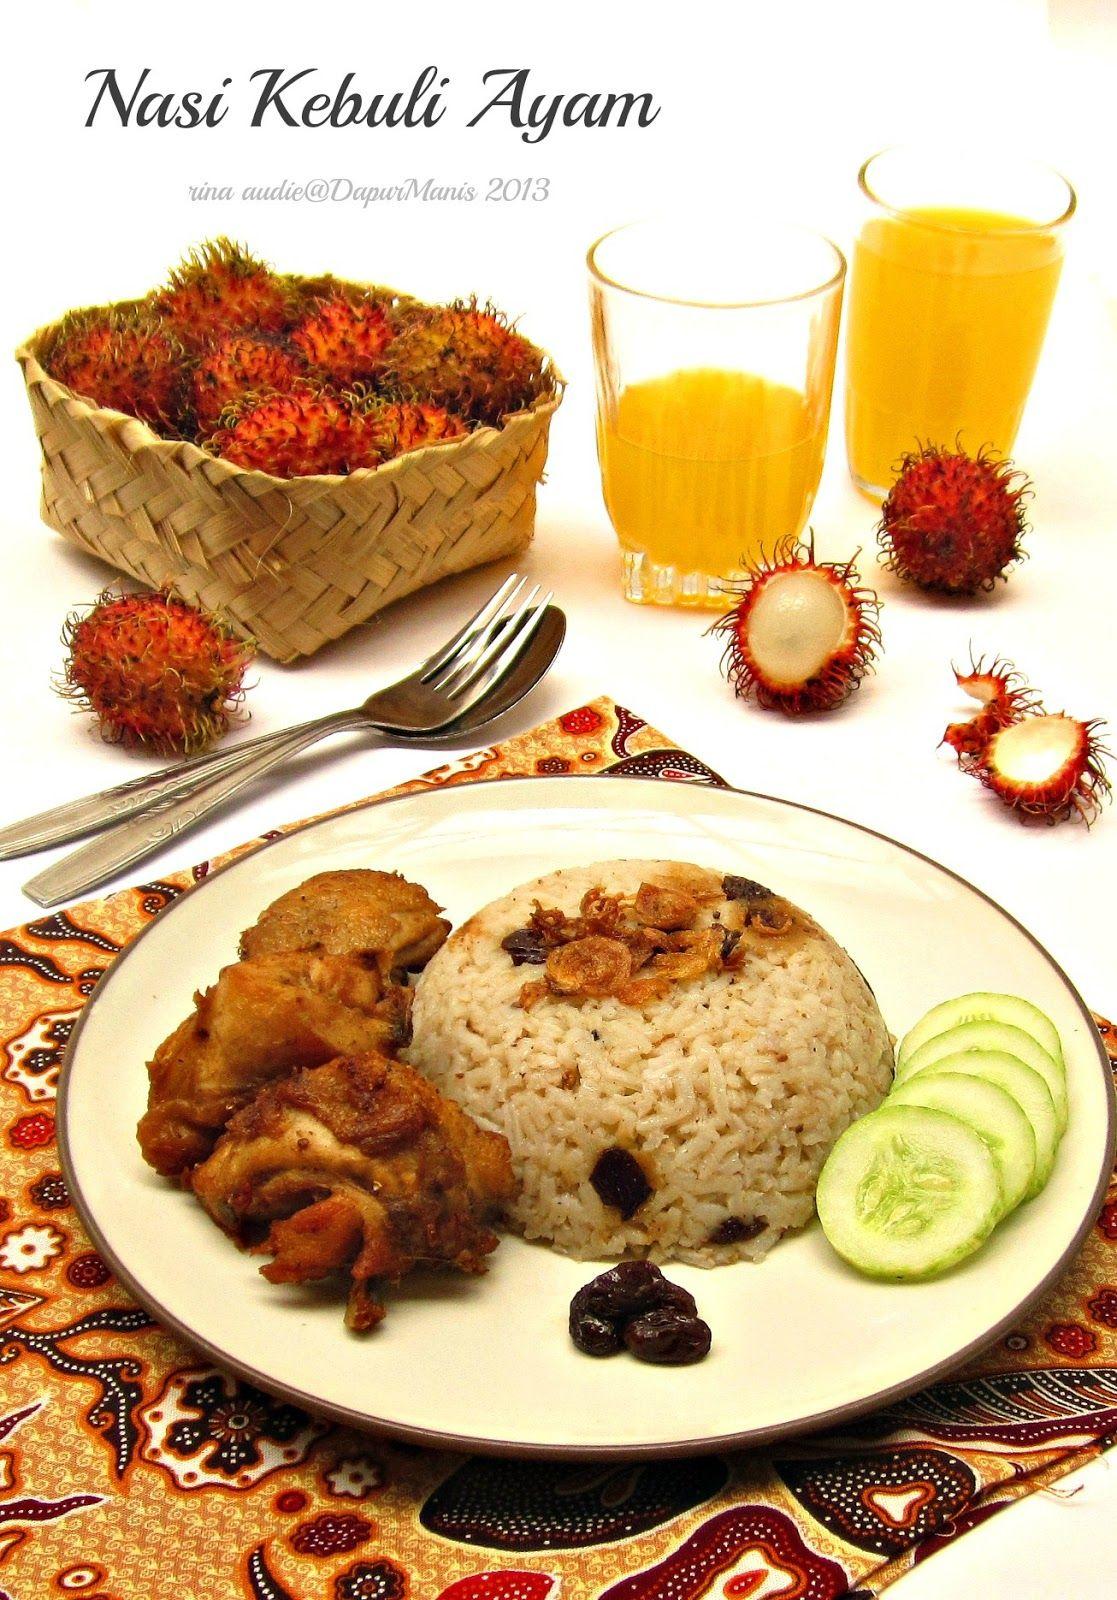 Assalamualaykum Hari Minggu Kemarin Saya Bikin Nasi Kebuli Ayam Udah Lama Saya Bookmark Resep Ini Resep Masakan Resep Makanan India Makanan Dan Minuman